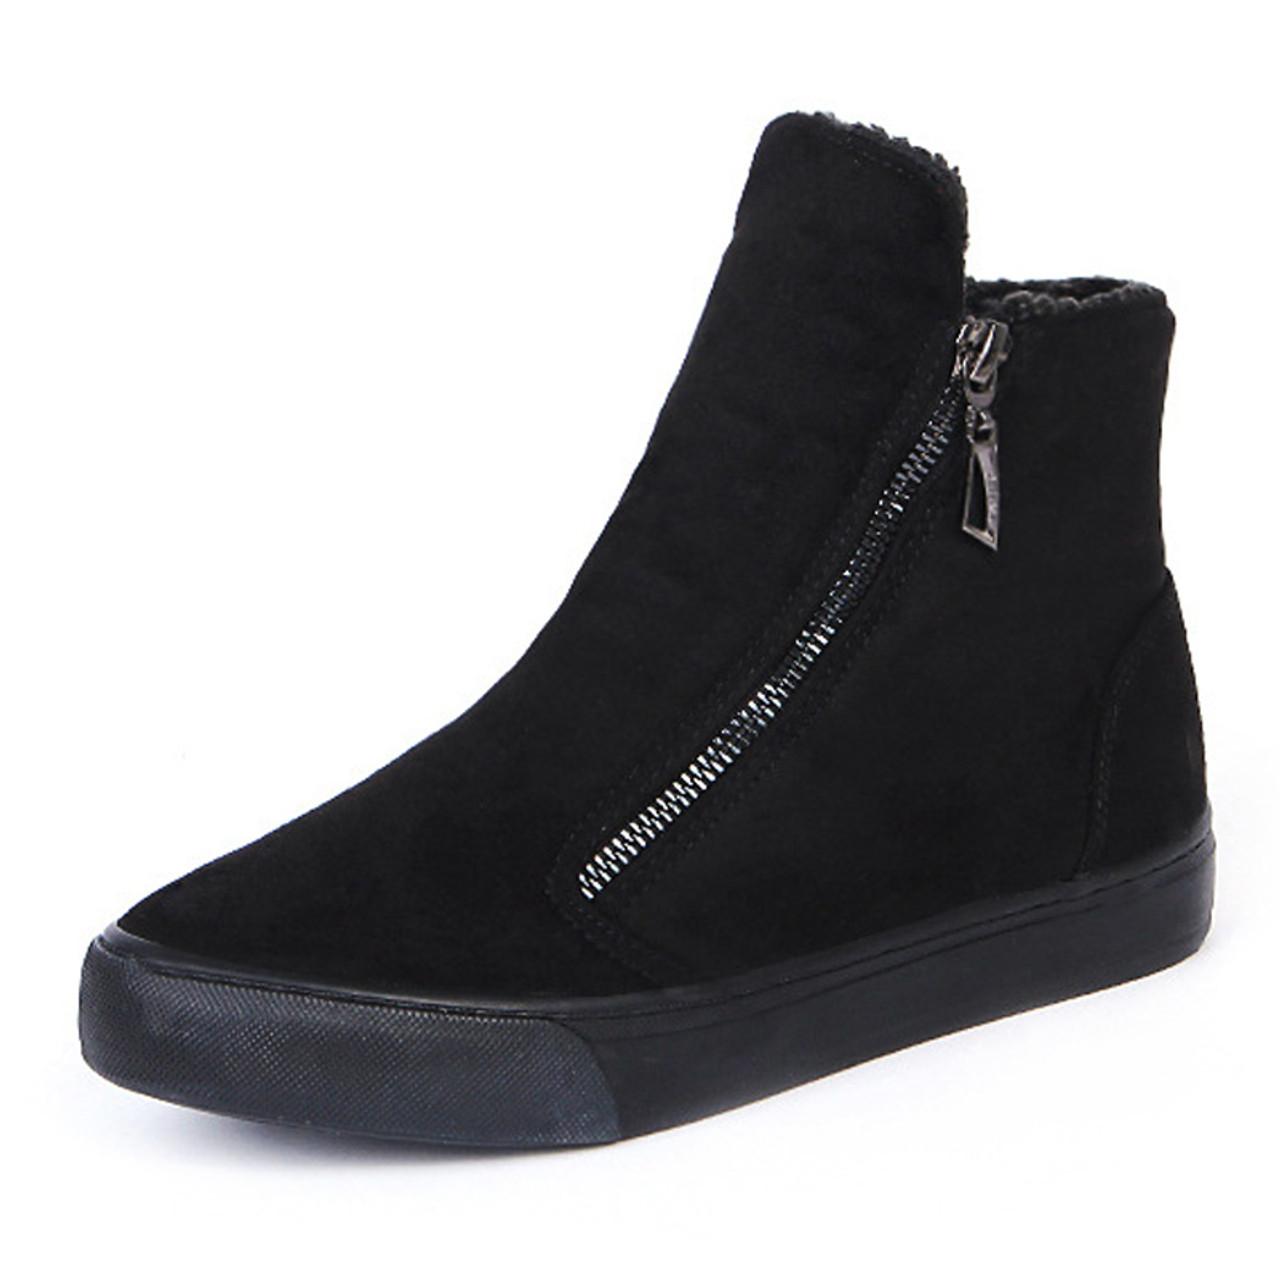 abafa0f5706 ... KHTAA Women s Winter Ankle Boots Female Zipper Flock Platform Snow Boot  Ladies Plush Sneakers Casual Flat ...